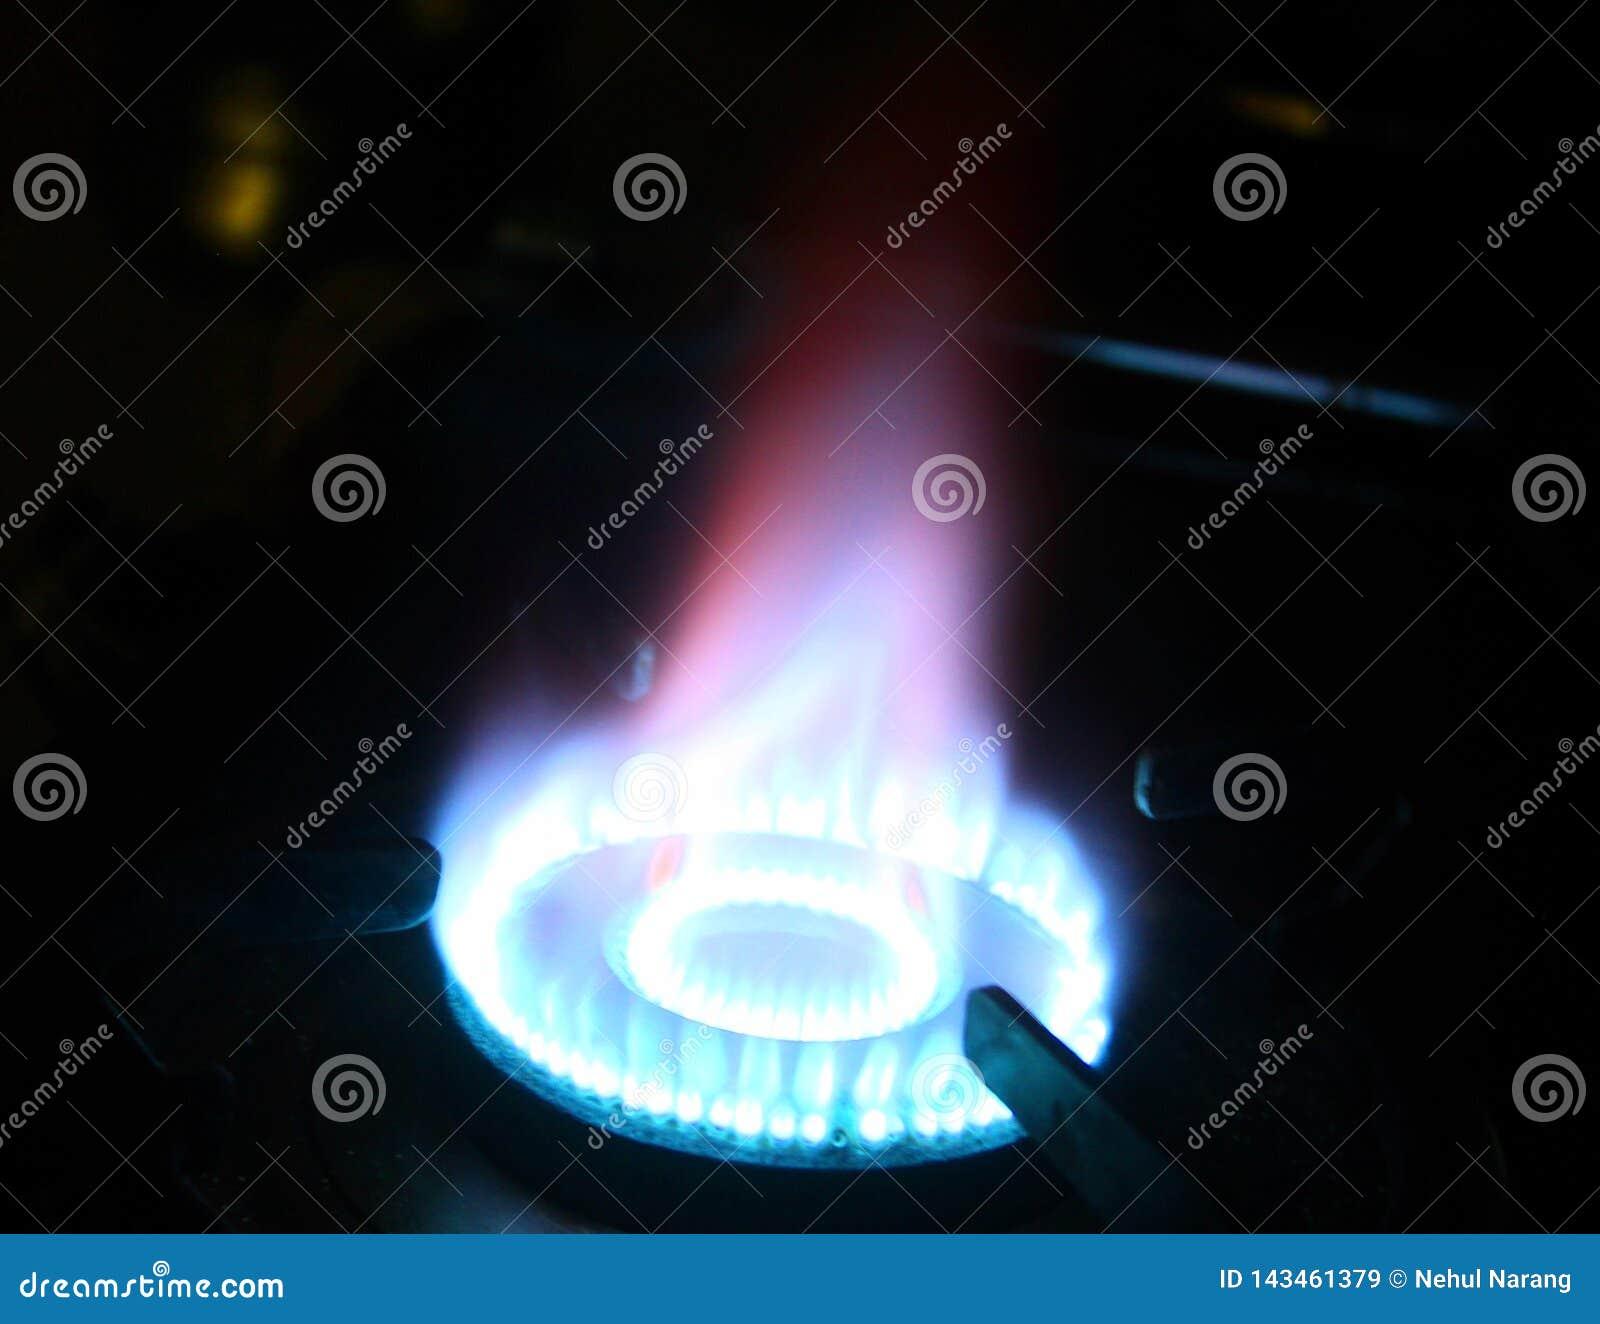 Vlammen op een gasfornuis in dark